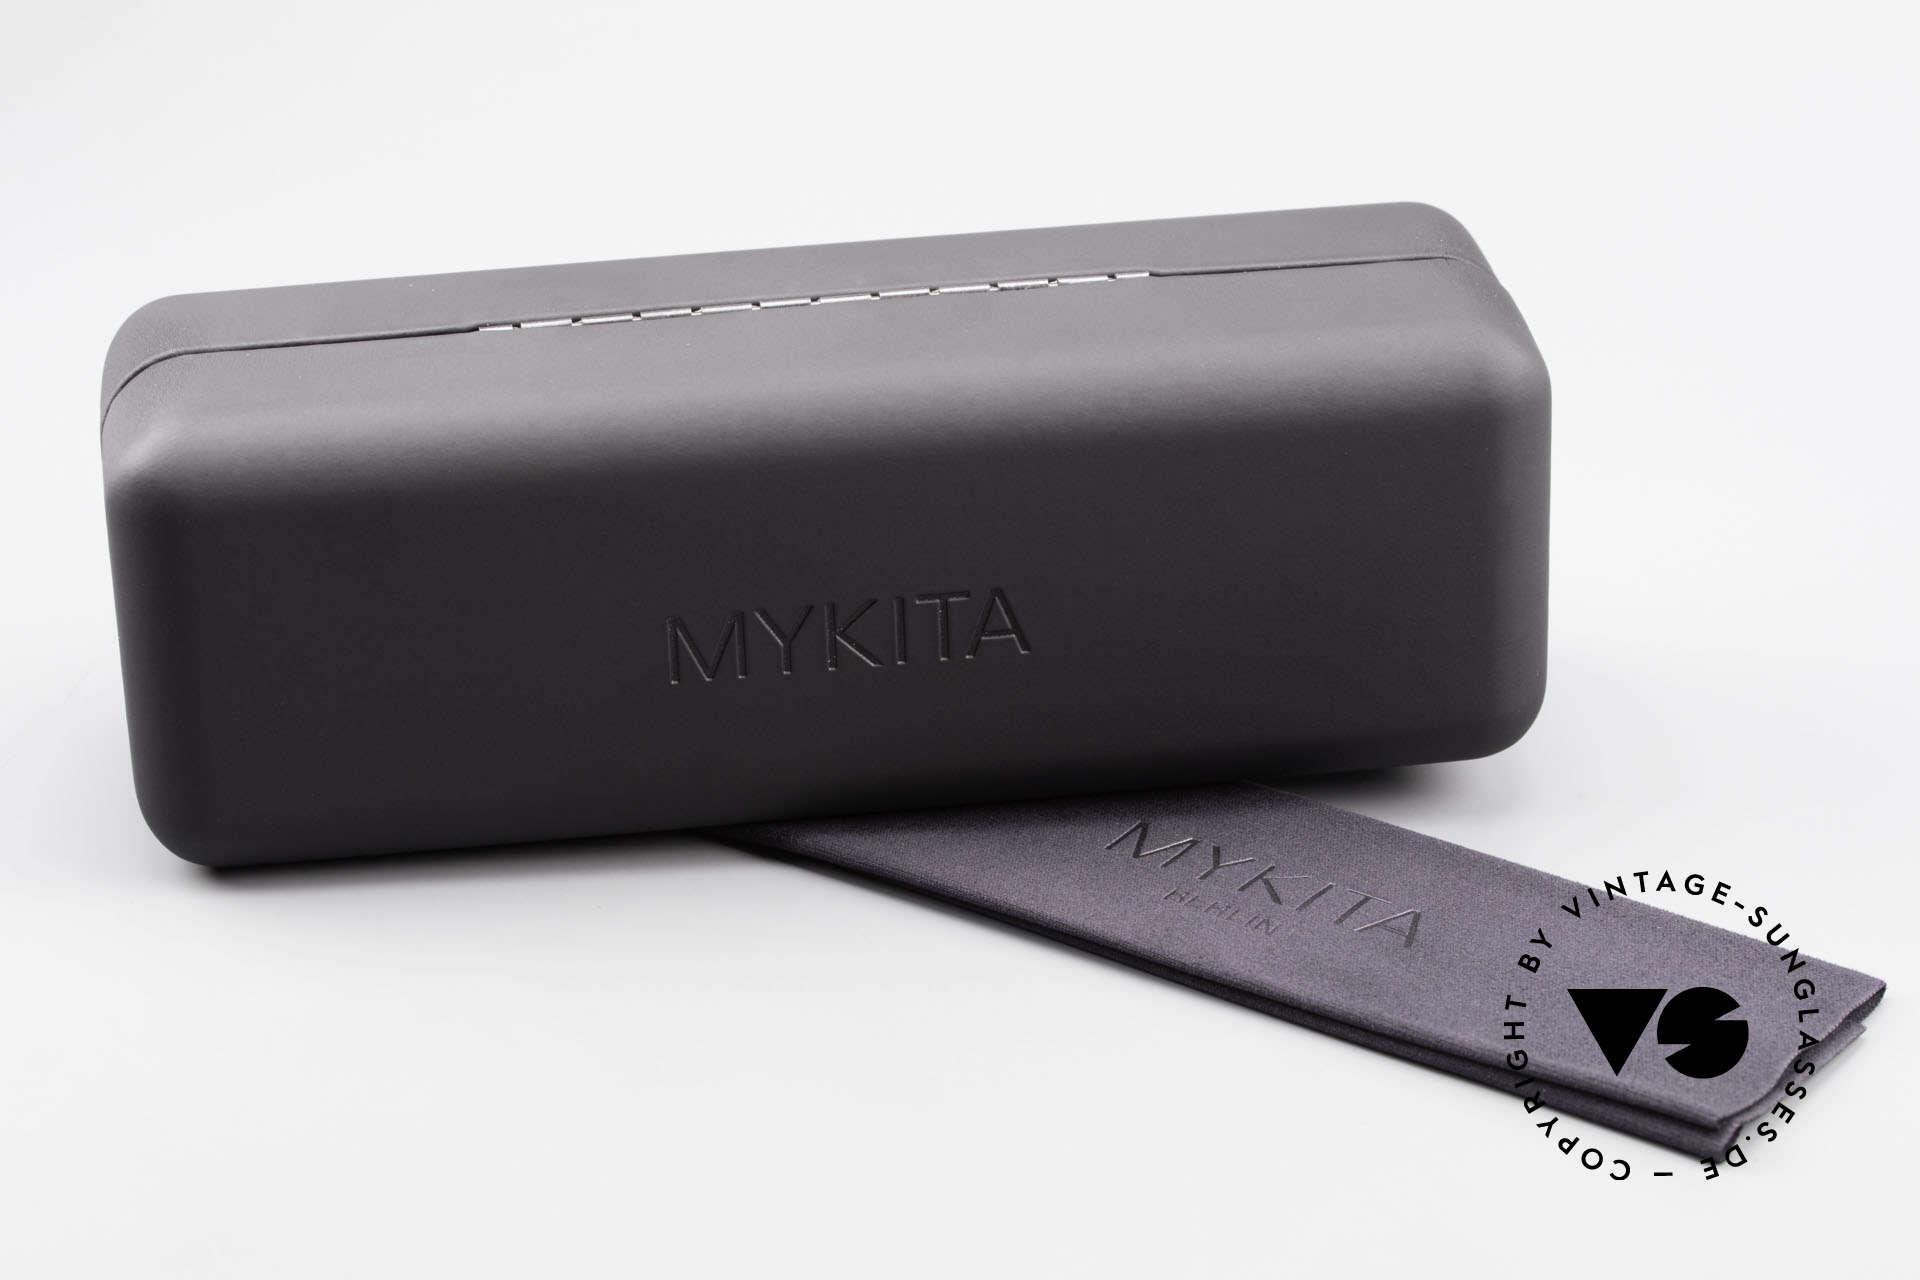 Mykita Chuck Futuristic Designer Sunglasses, Size: medium, Made for Men and Women